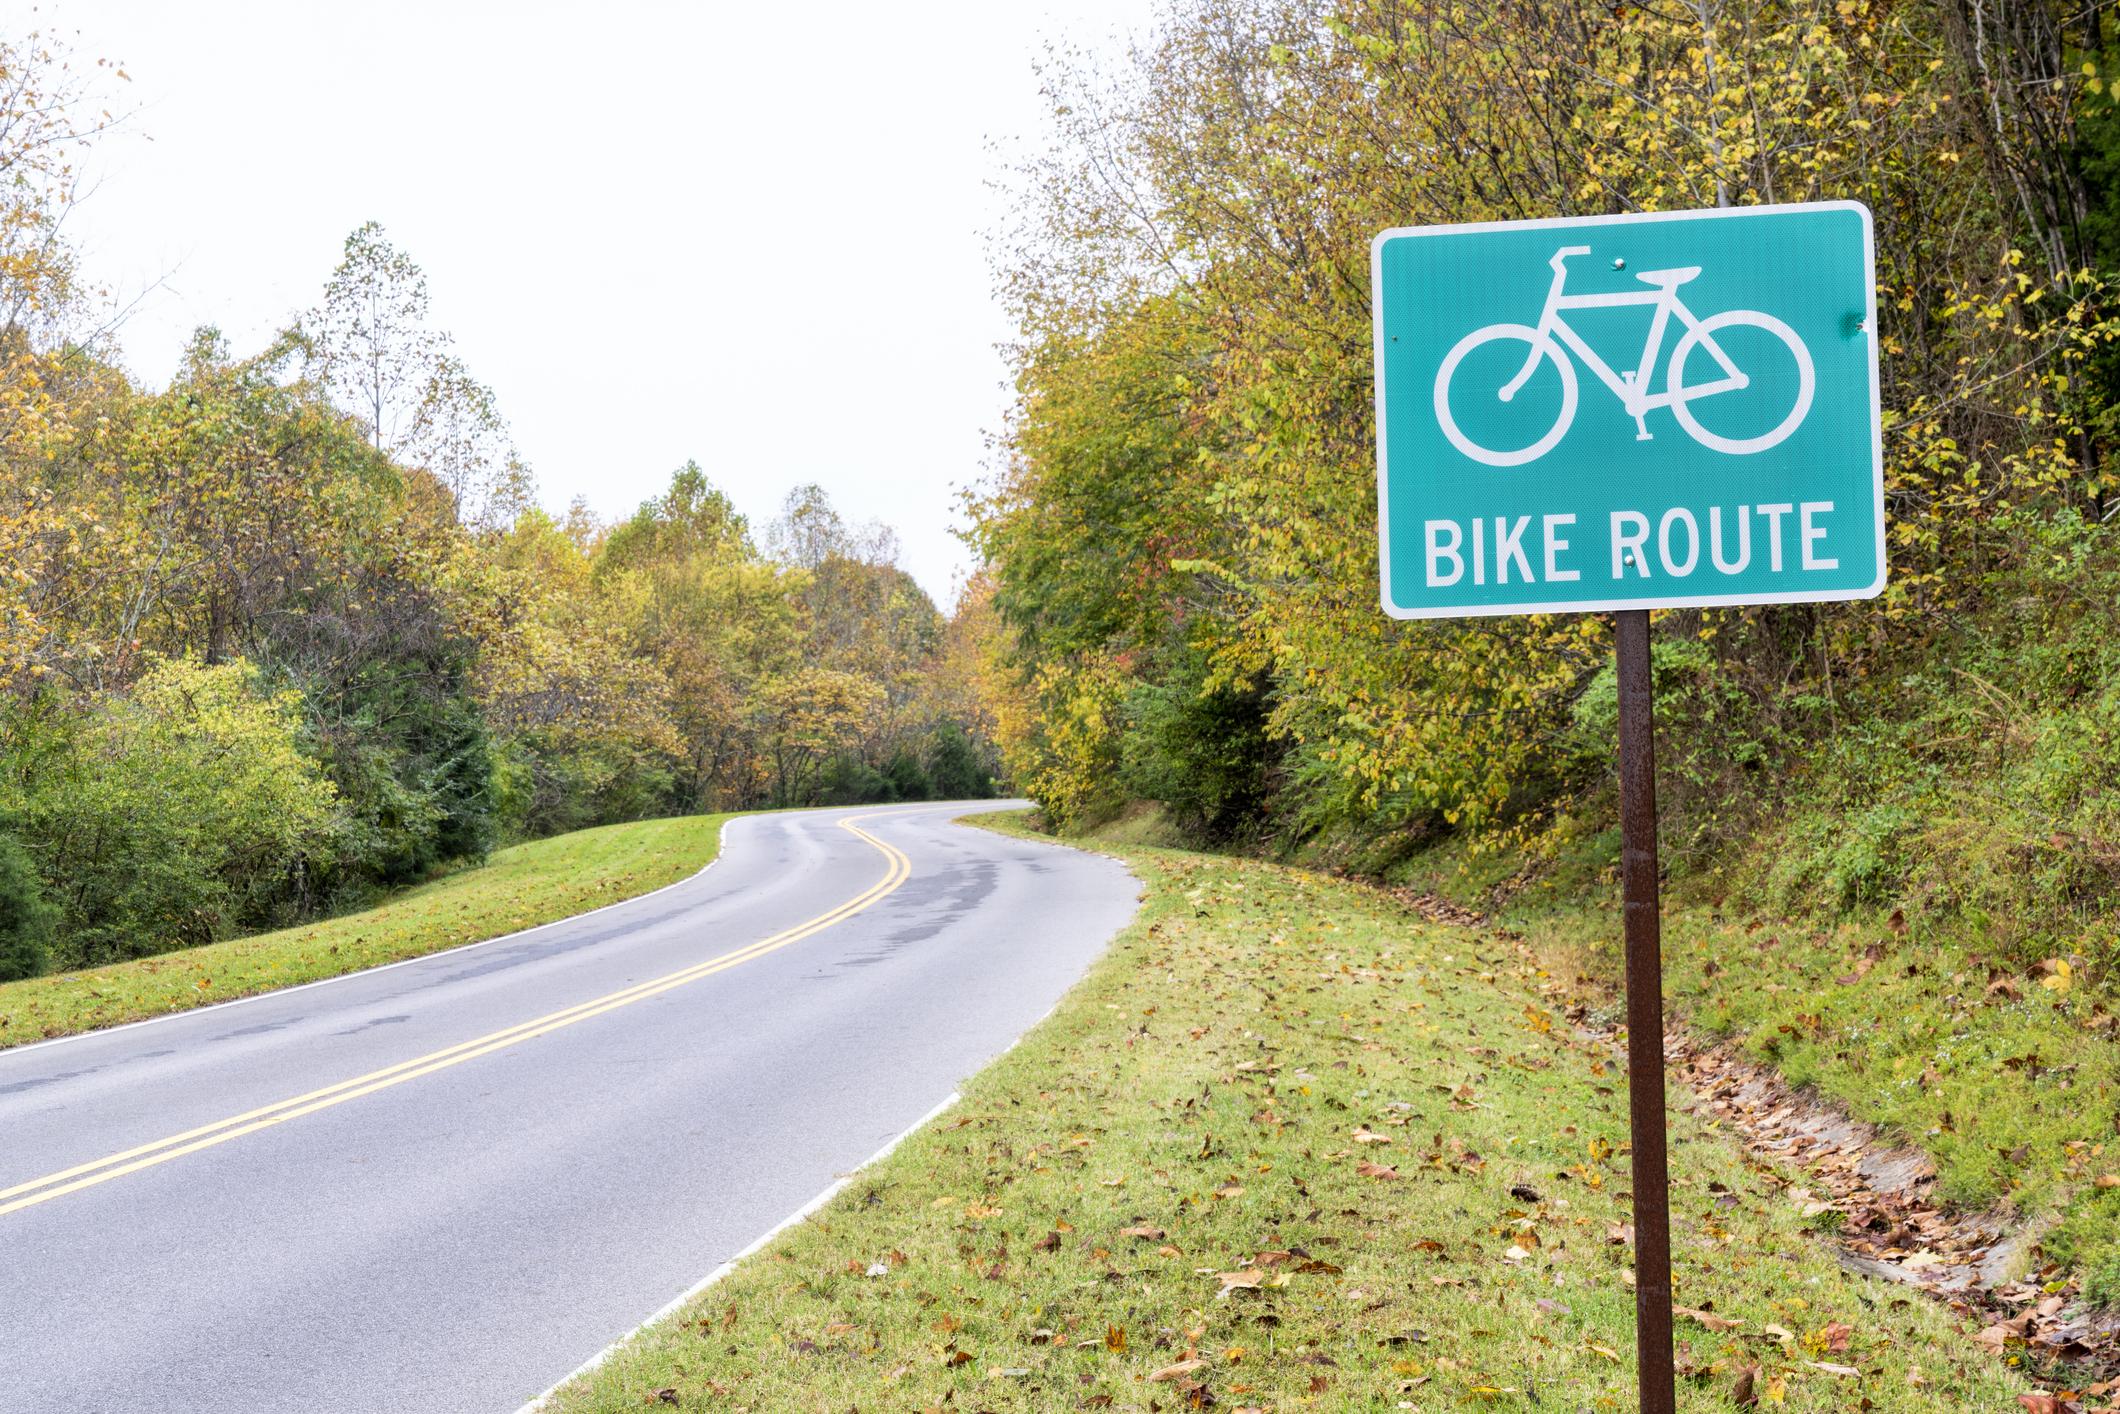 Bike Route along a blacktop highway.